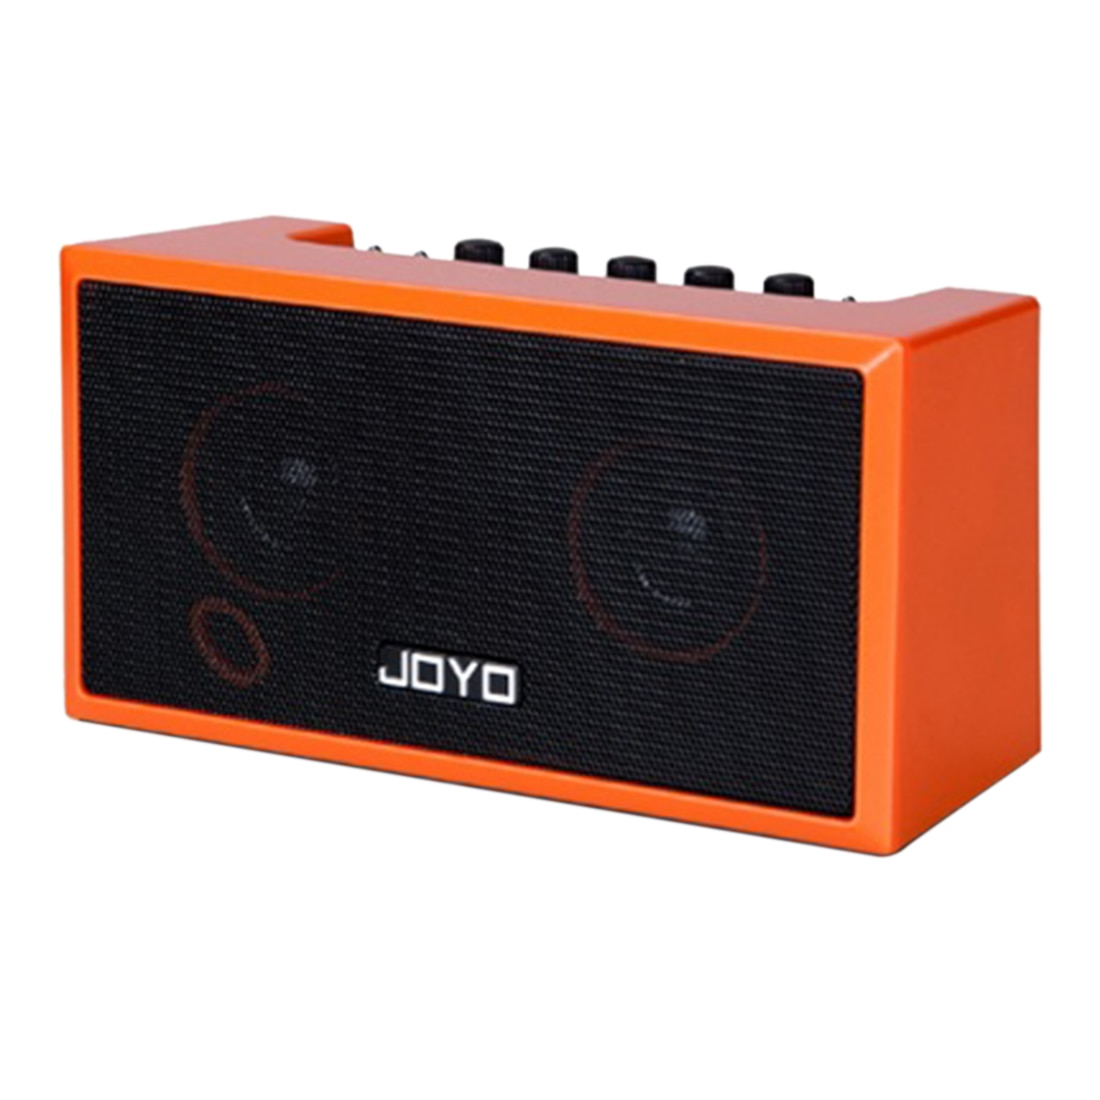 JOYO TOP-GT مصغرة الشعبية خشبية الغيتار مكبر للصوت المحمولة قابلة للشحن بلوتوث المتكلم للأطفال التعليم هدية-برتقالي أسود